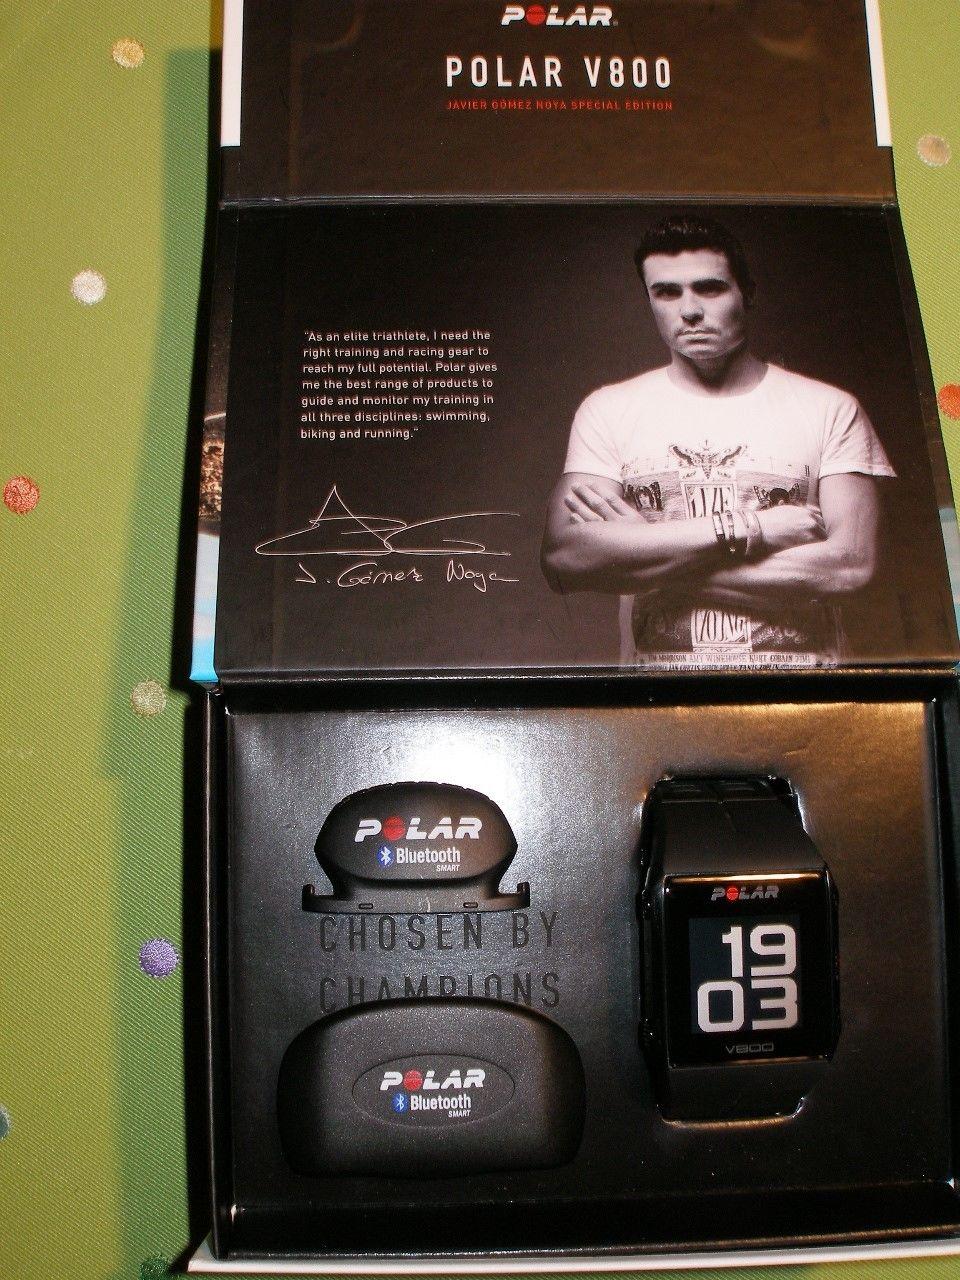 Polar V800 Laufuhr schwarz Javier Gomez Noya Special Edition